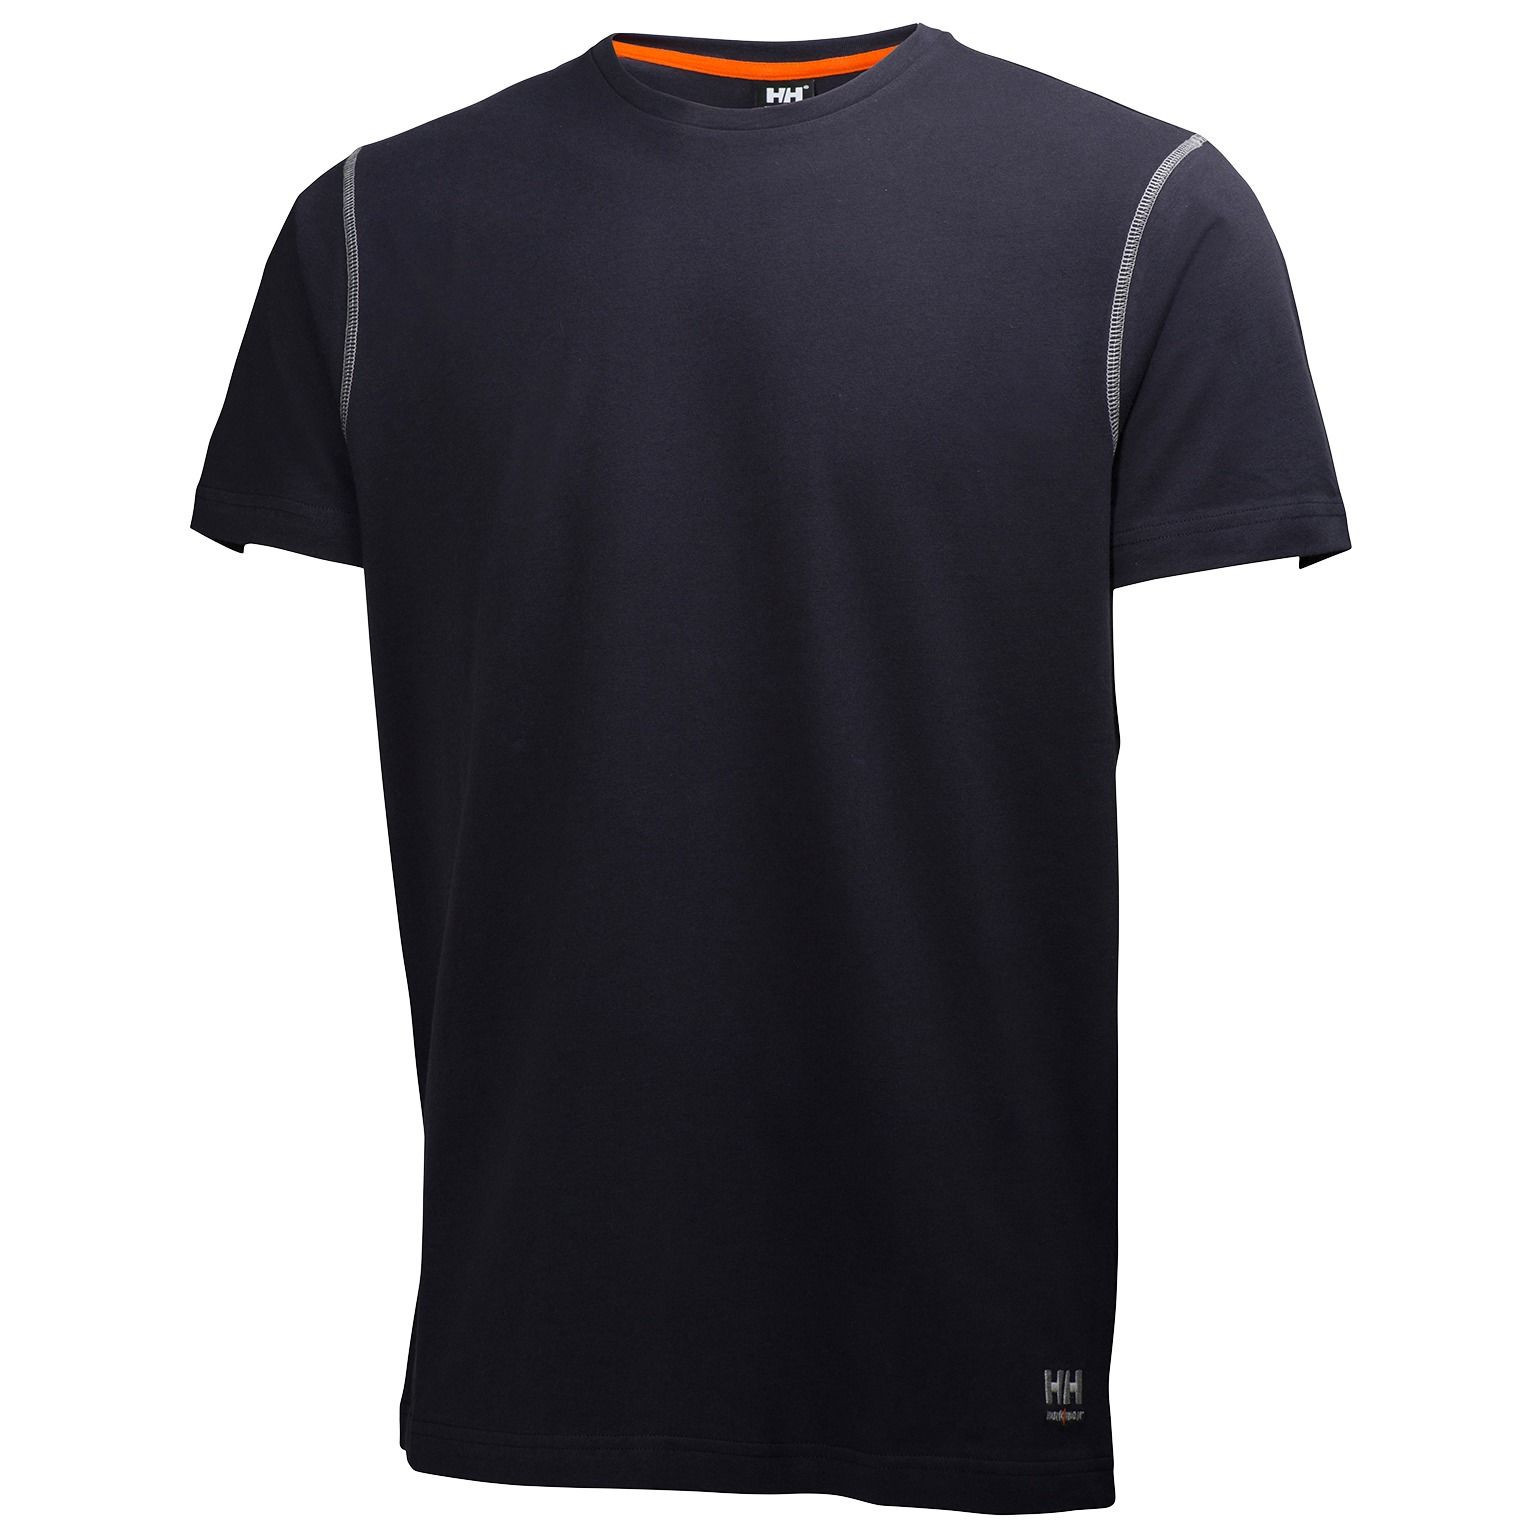 Футболка Helly Hansen Oxford T-Shirt - 79024